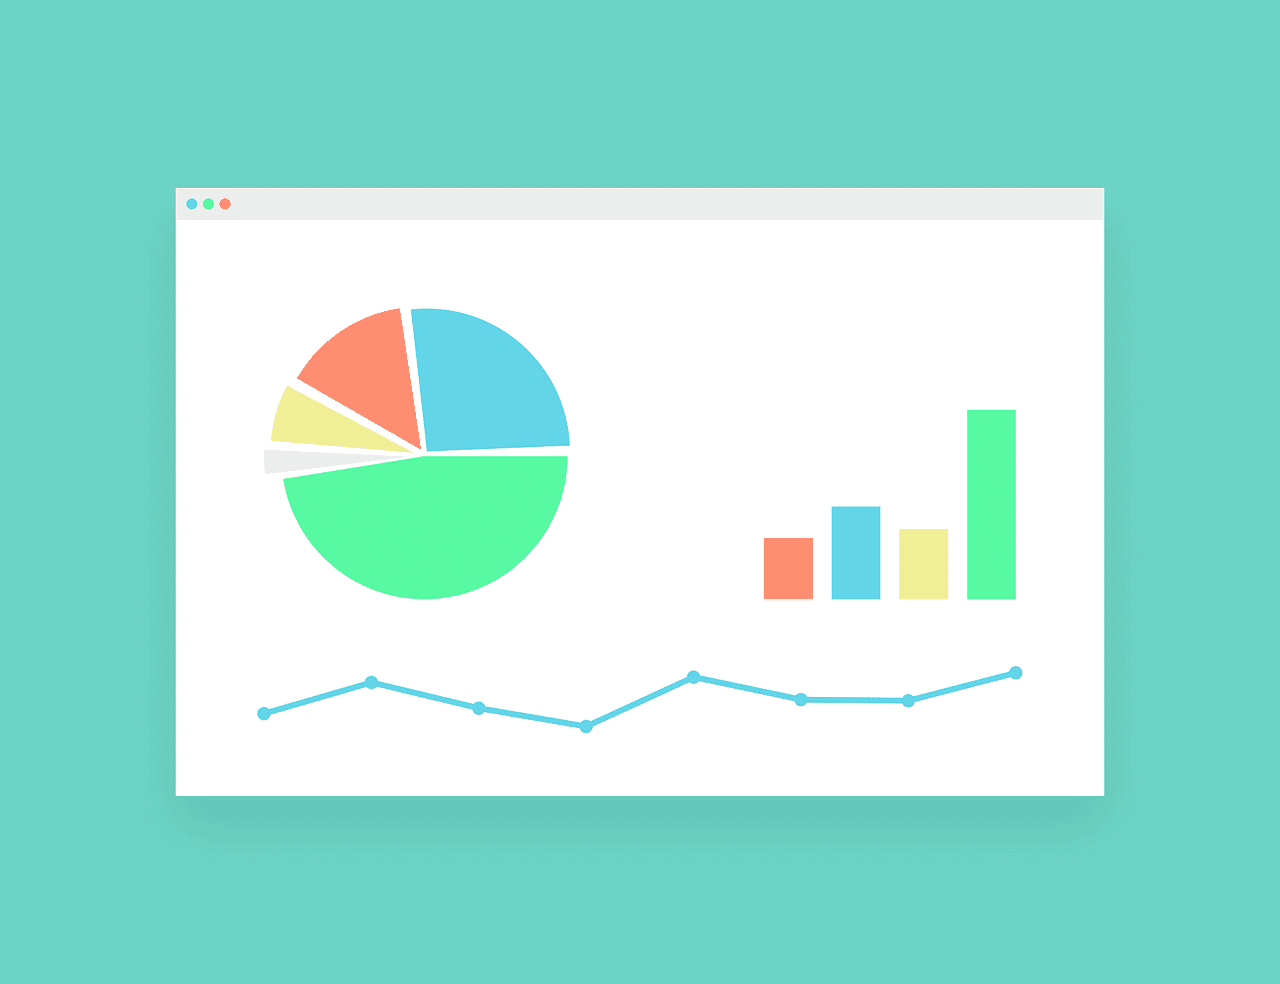 【Python】Excelファイルを新規作成・読み込み・書き込み処理まとめ